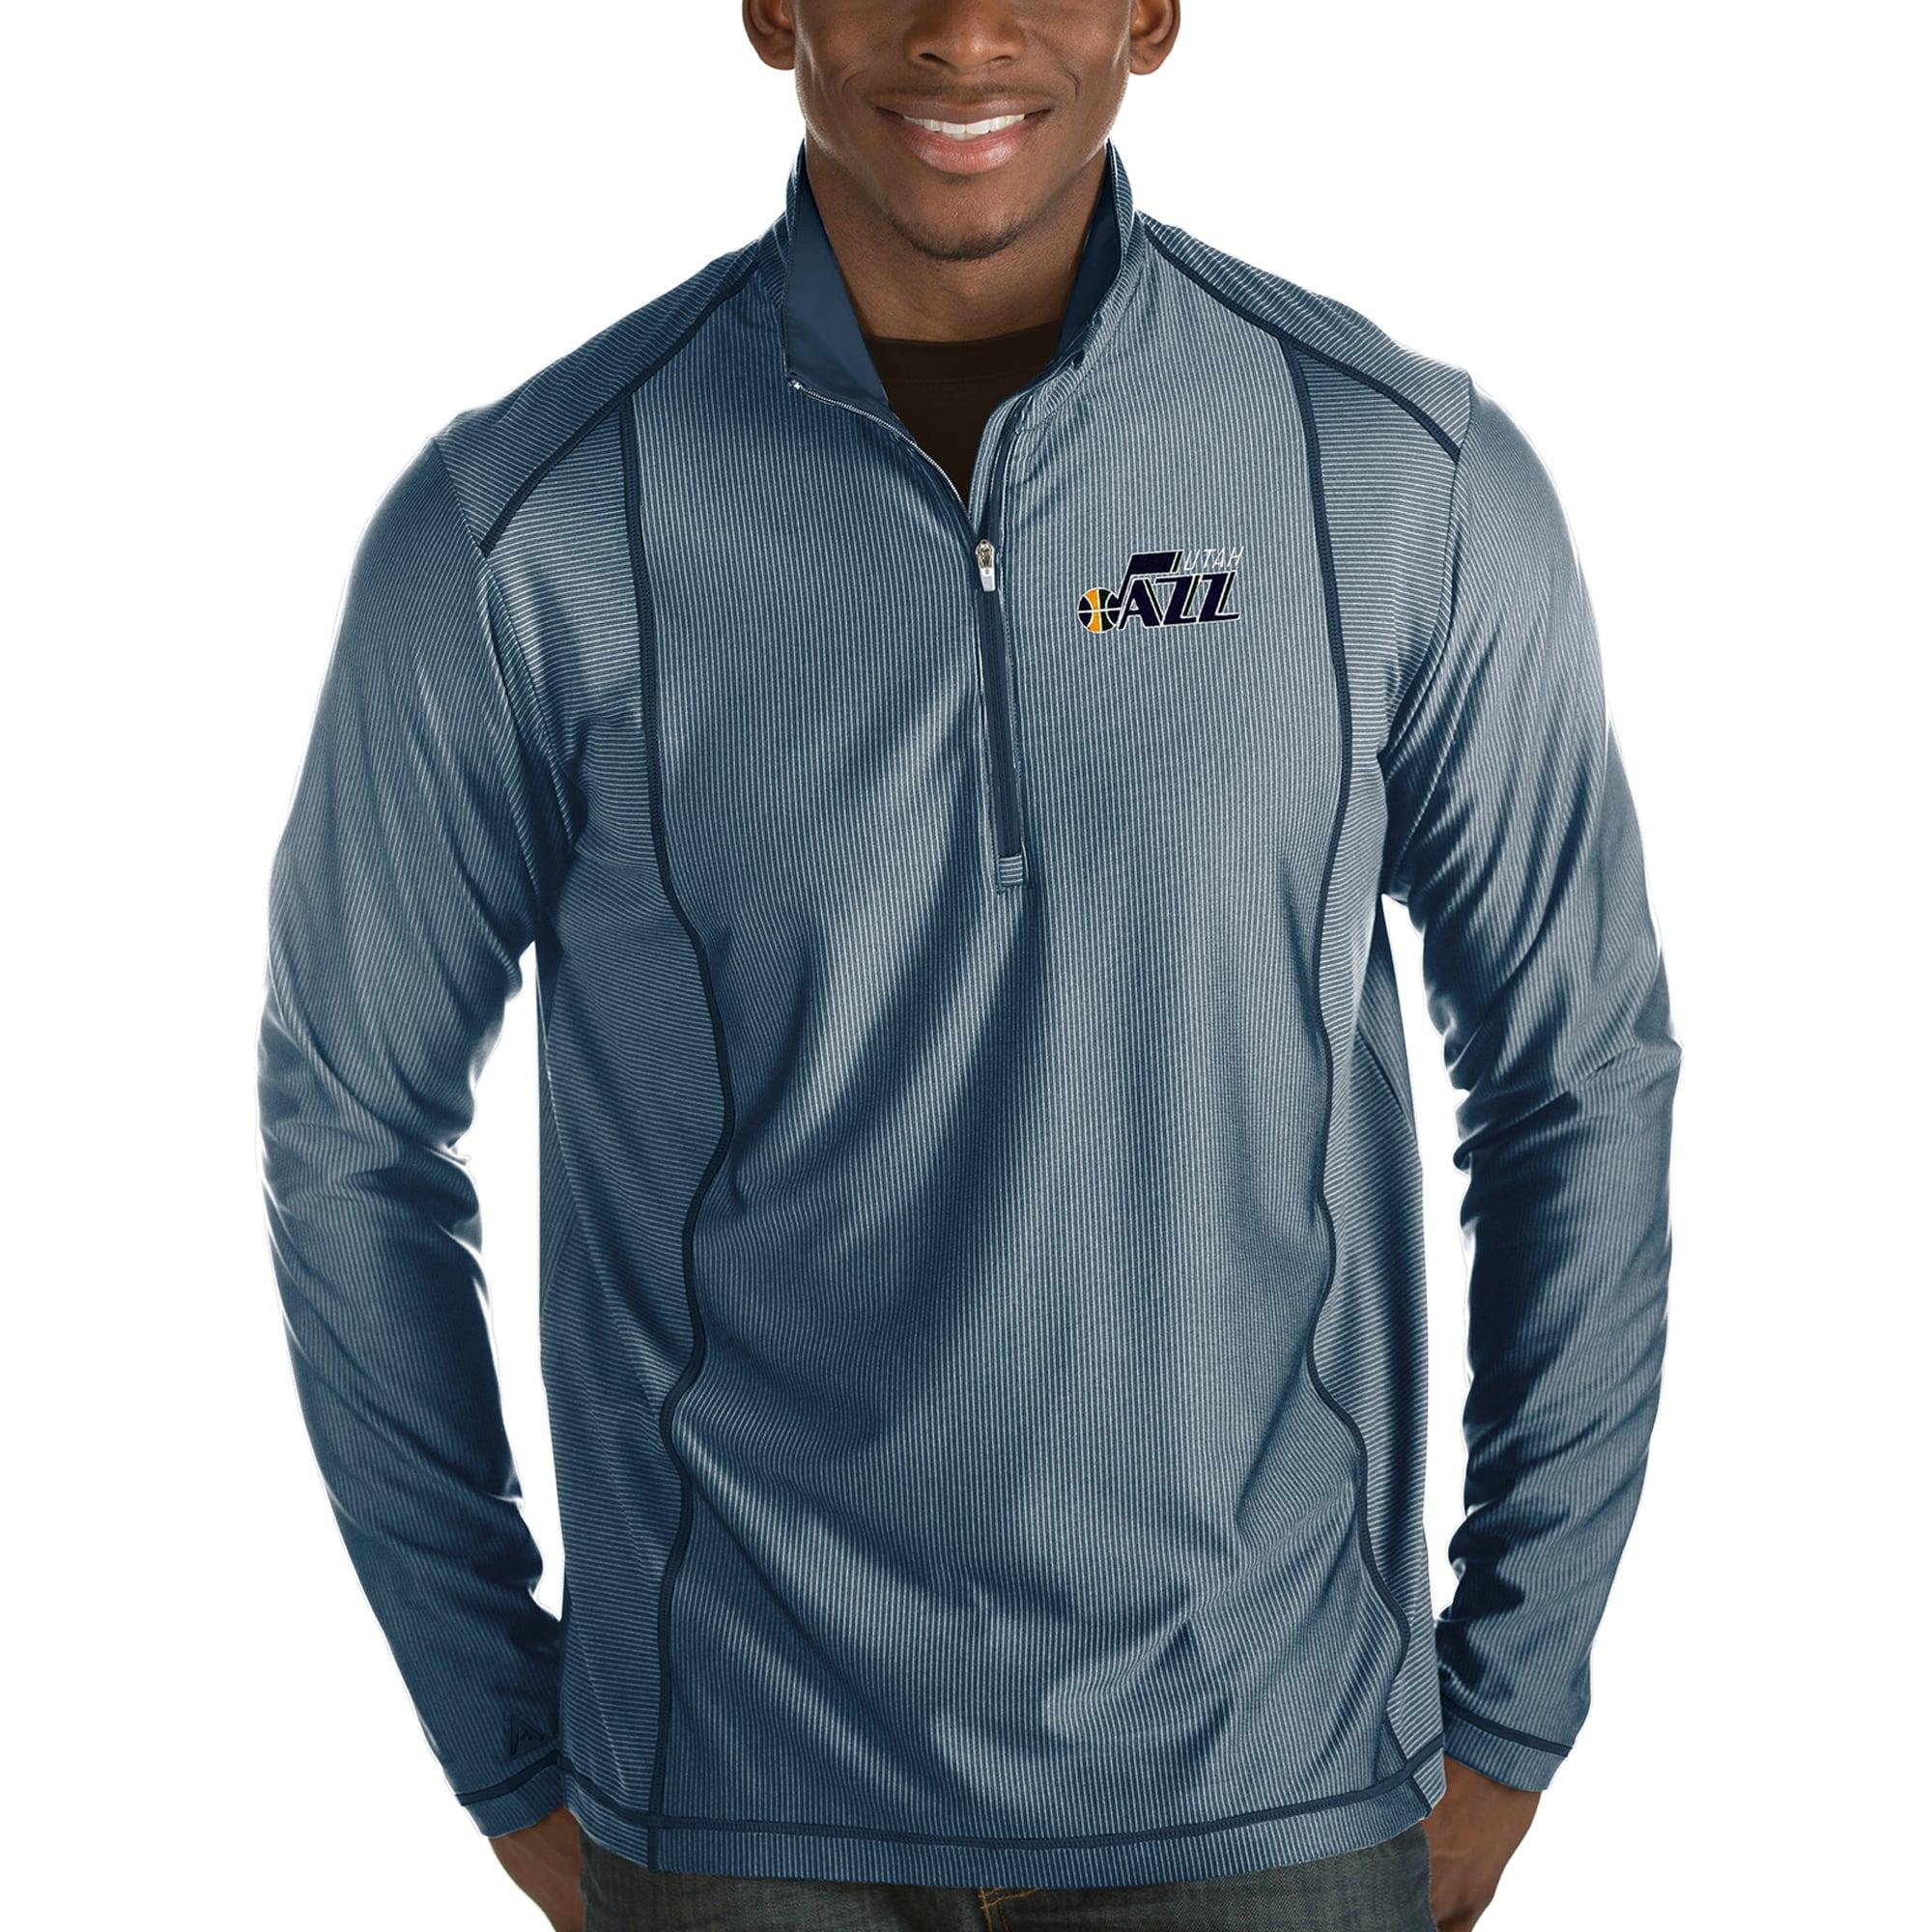 Utah Jazz Antigua Tempo Half-Zip Pullover Jacket - Navy